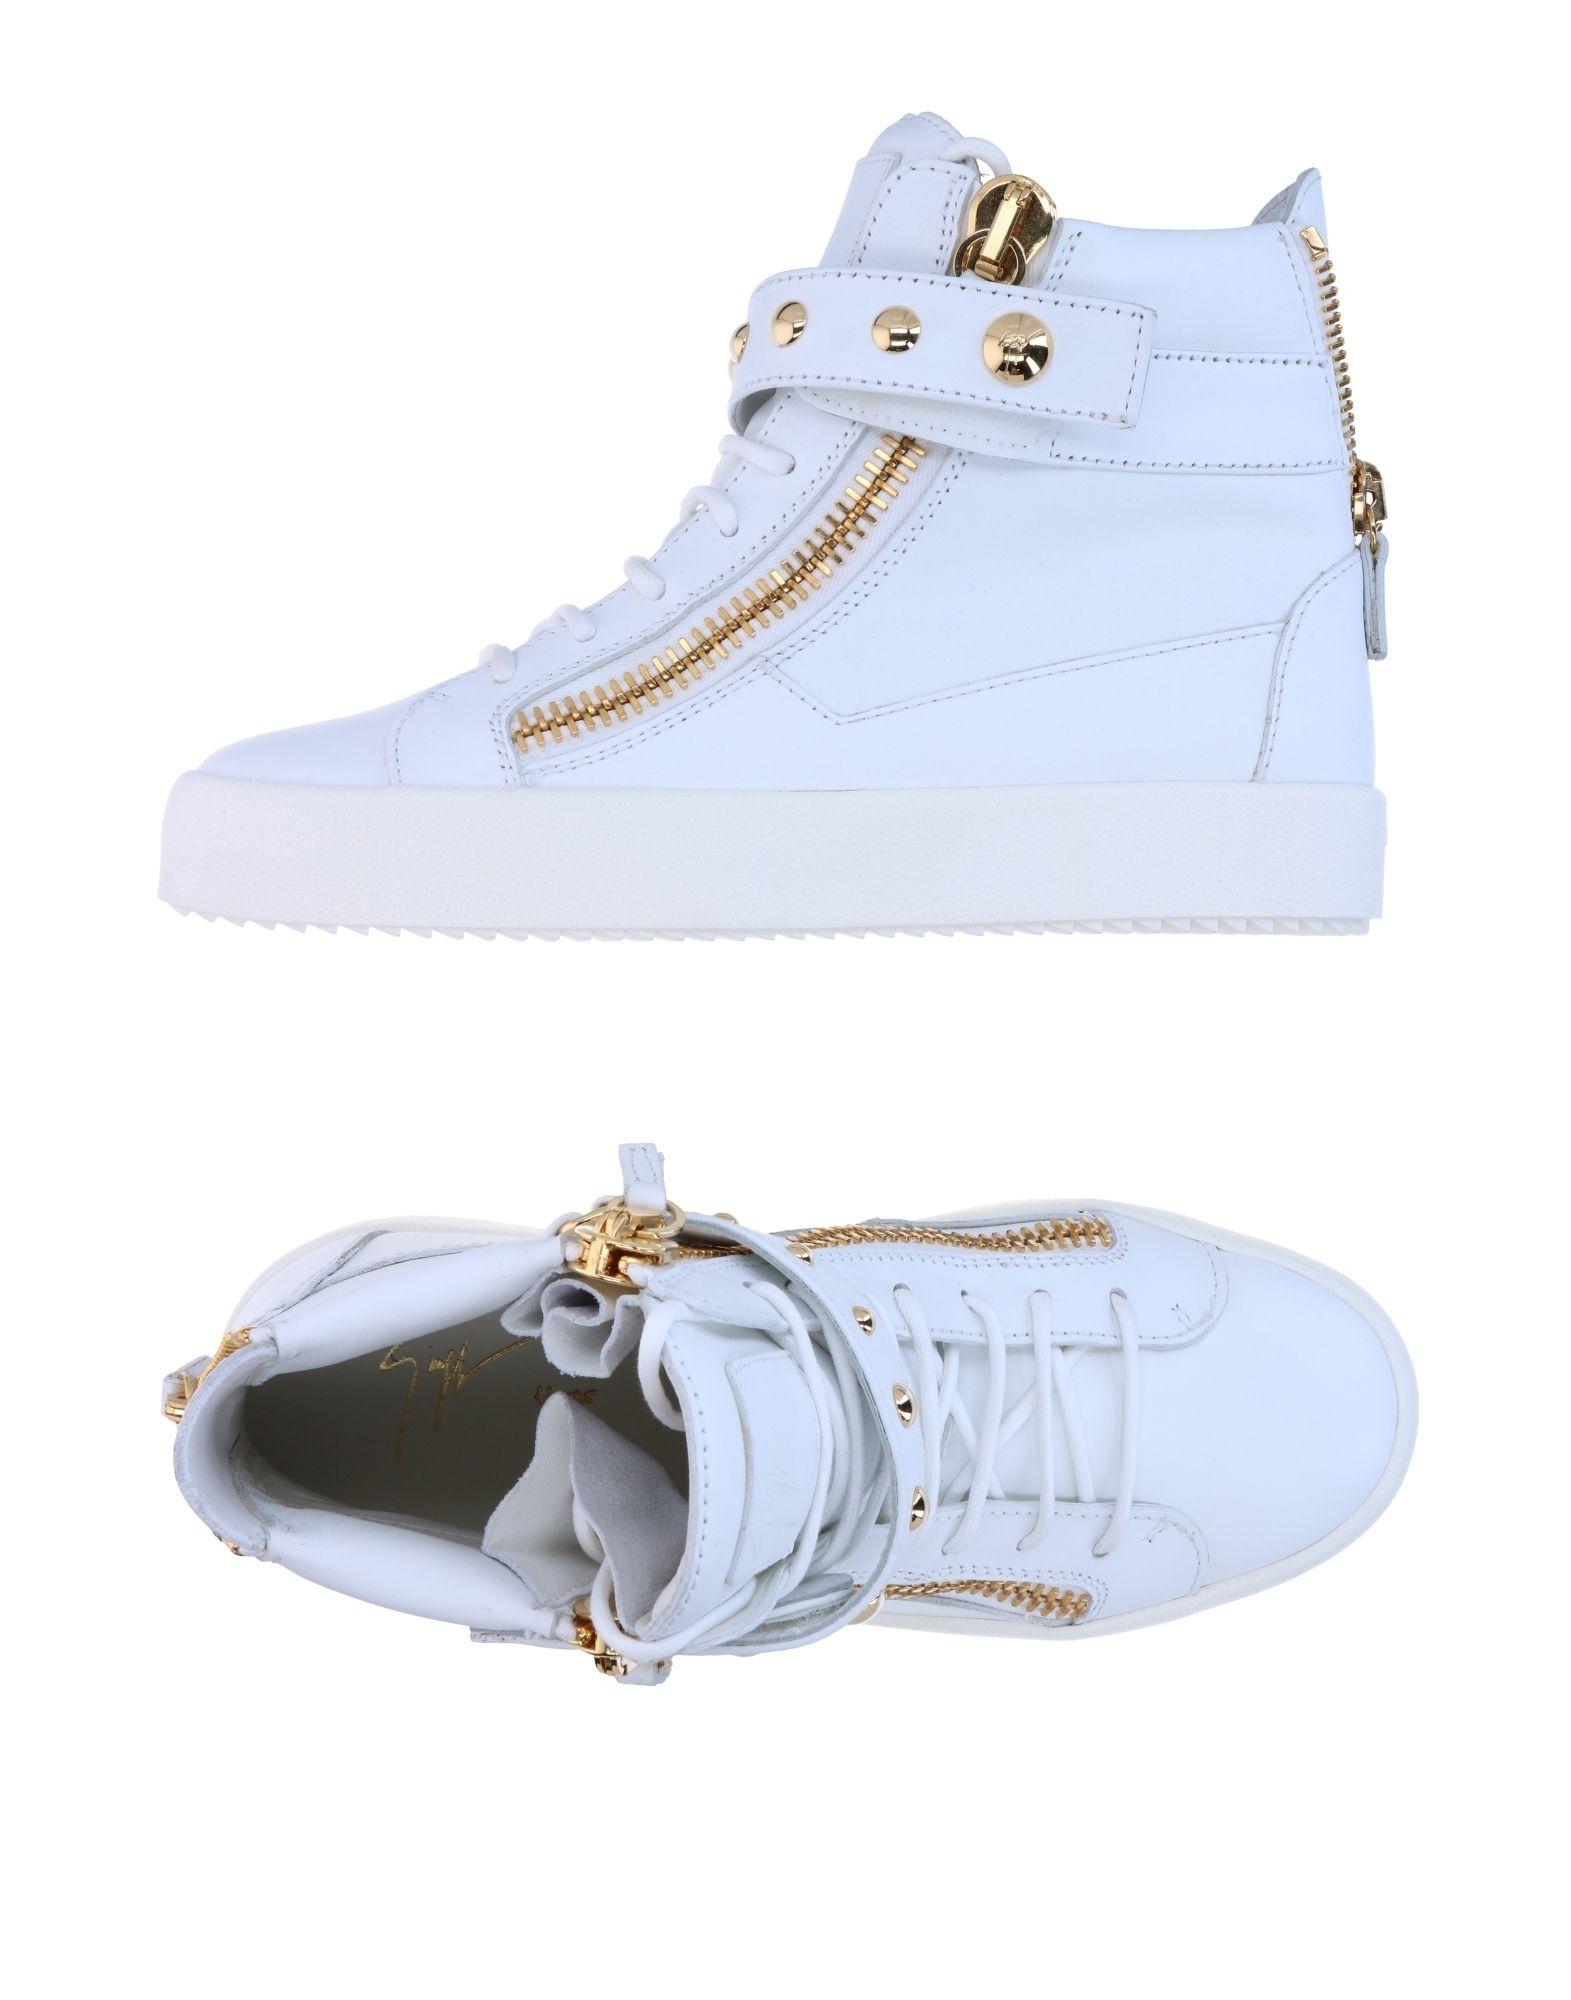 Giuseppe Zanotti Sneakers Herren  11264282NB Gute Qualität beliebte Schuhe